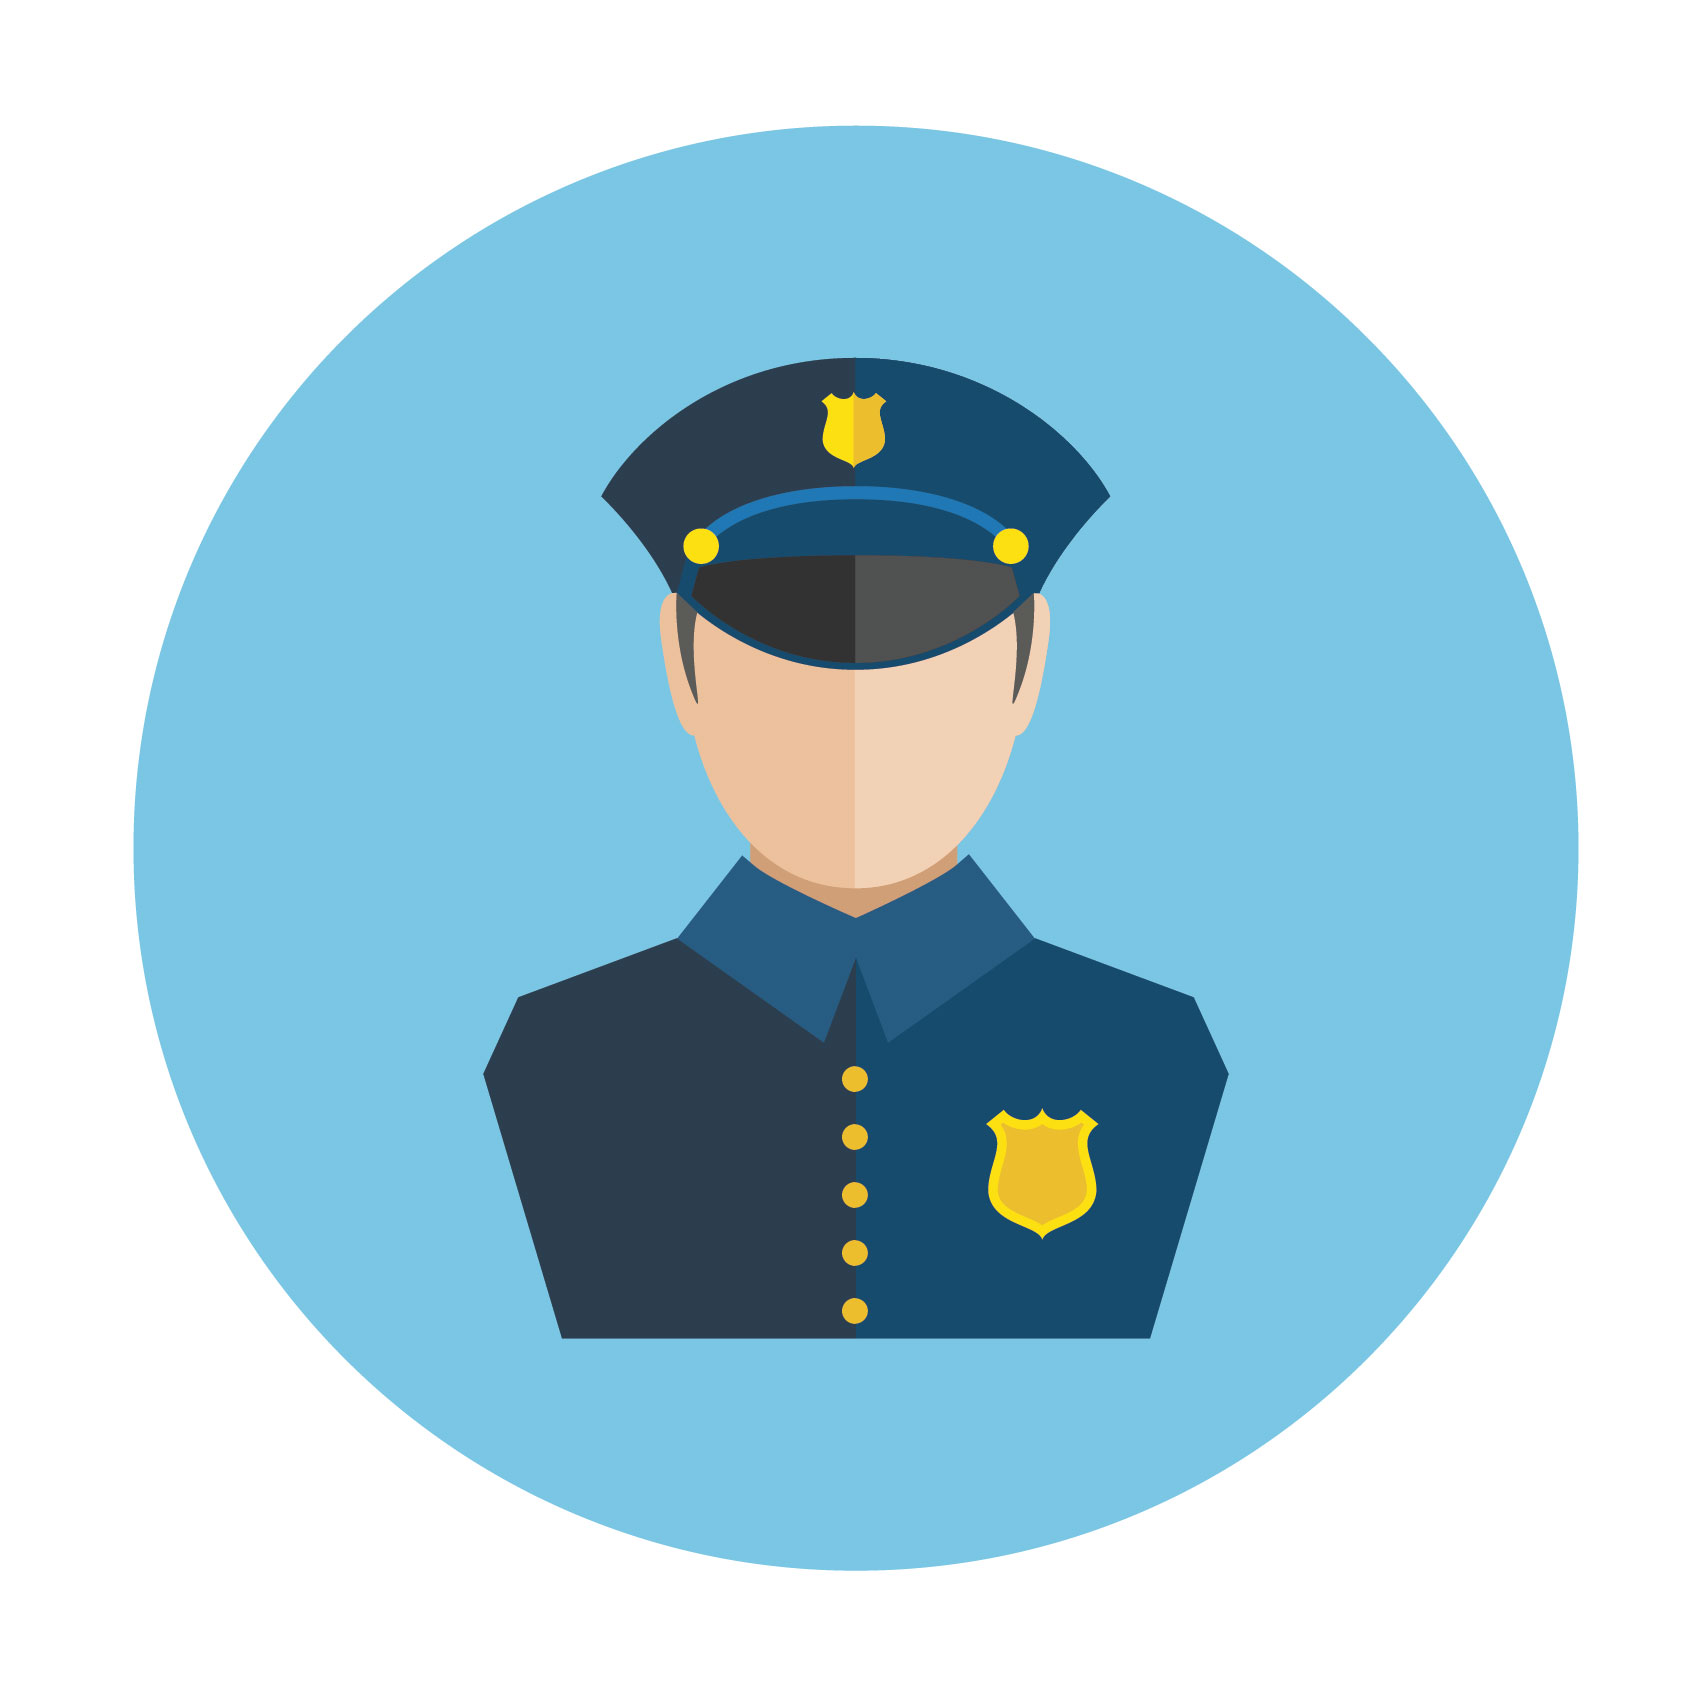 policeman-01.jpg